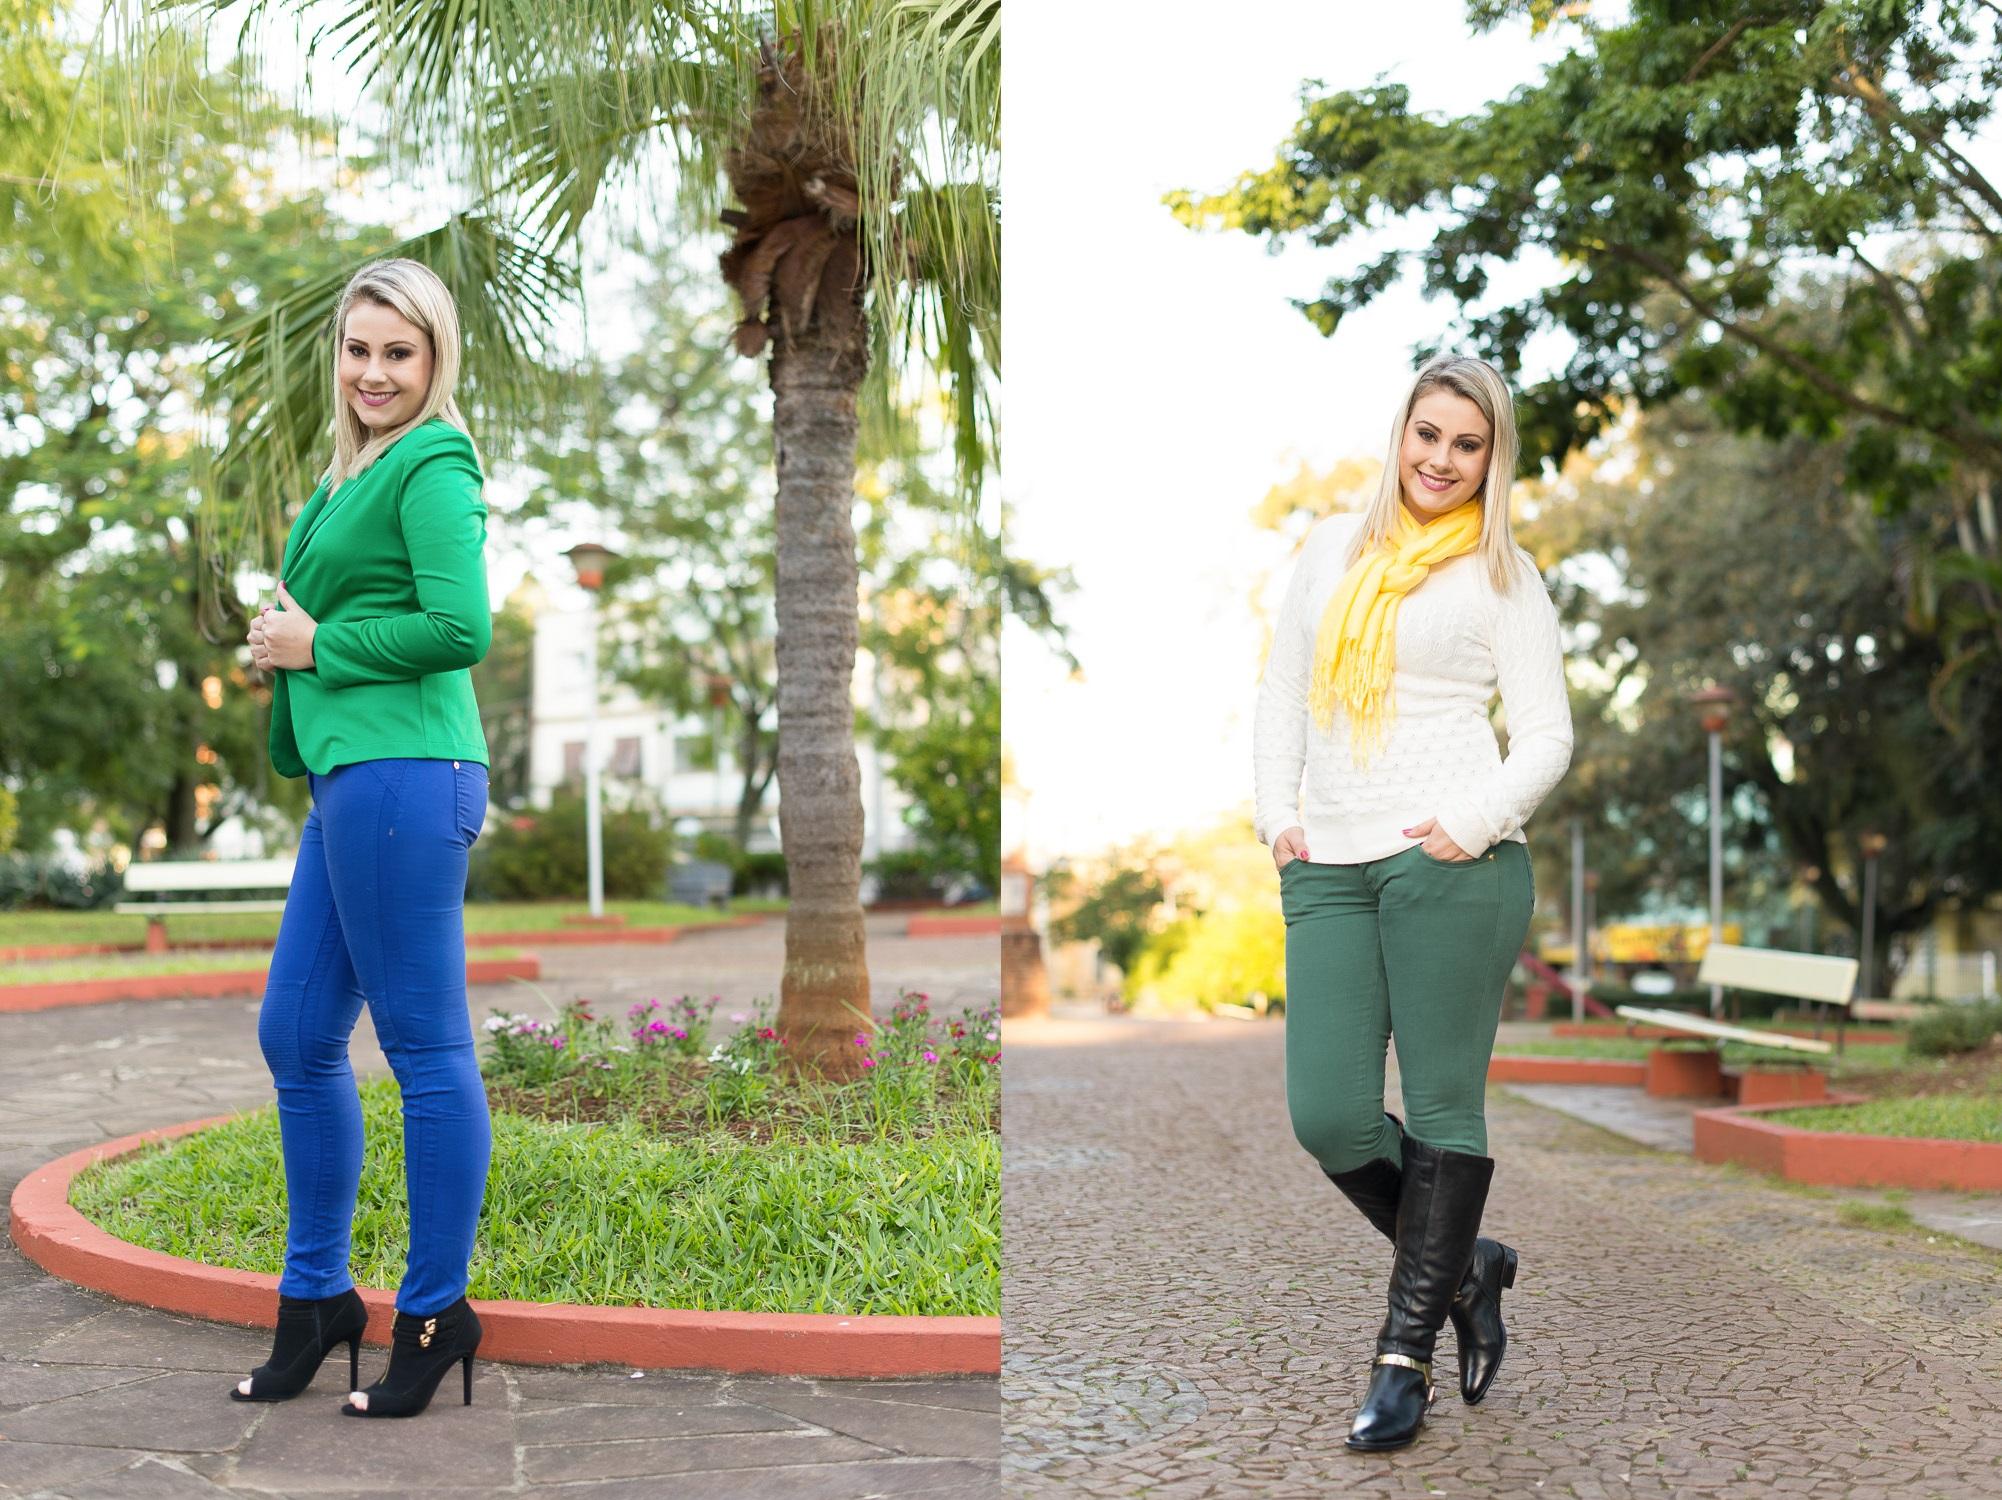 dsc_0351-editar-horzjkjk Looks com tons de cores da Bandeira do Brasil!